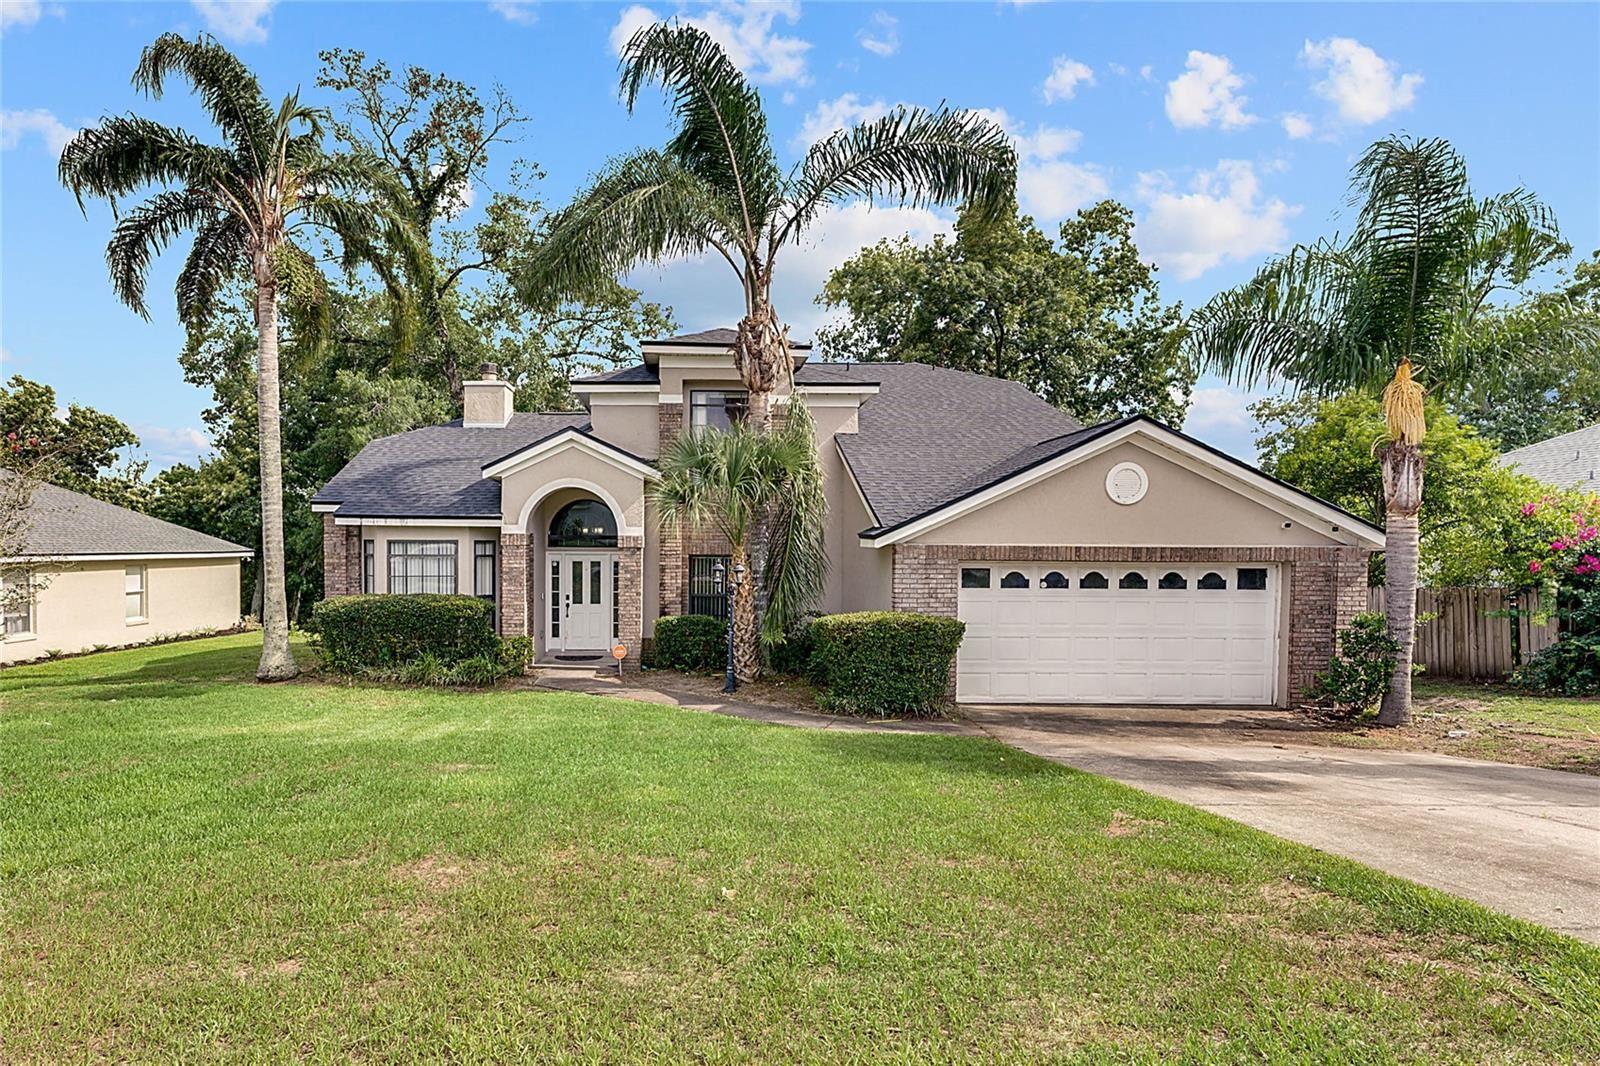 7455 HIGH LAKE DRIVE, Orlando, FL 32818 - #: O5954225